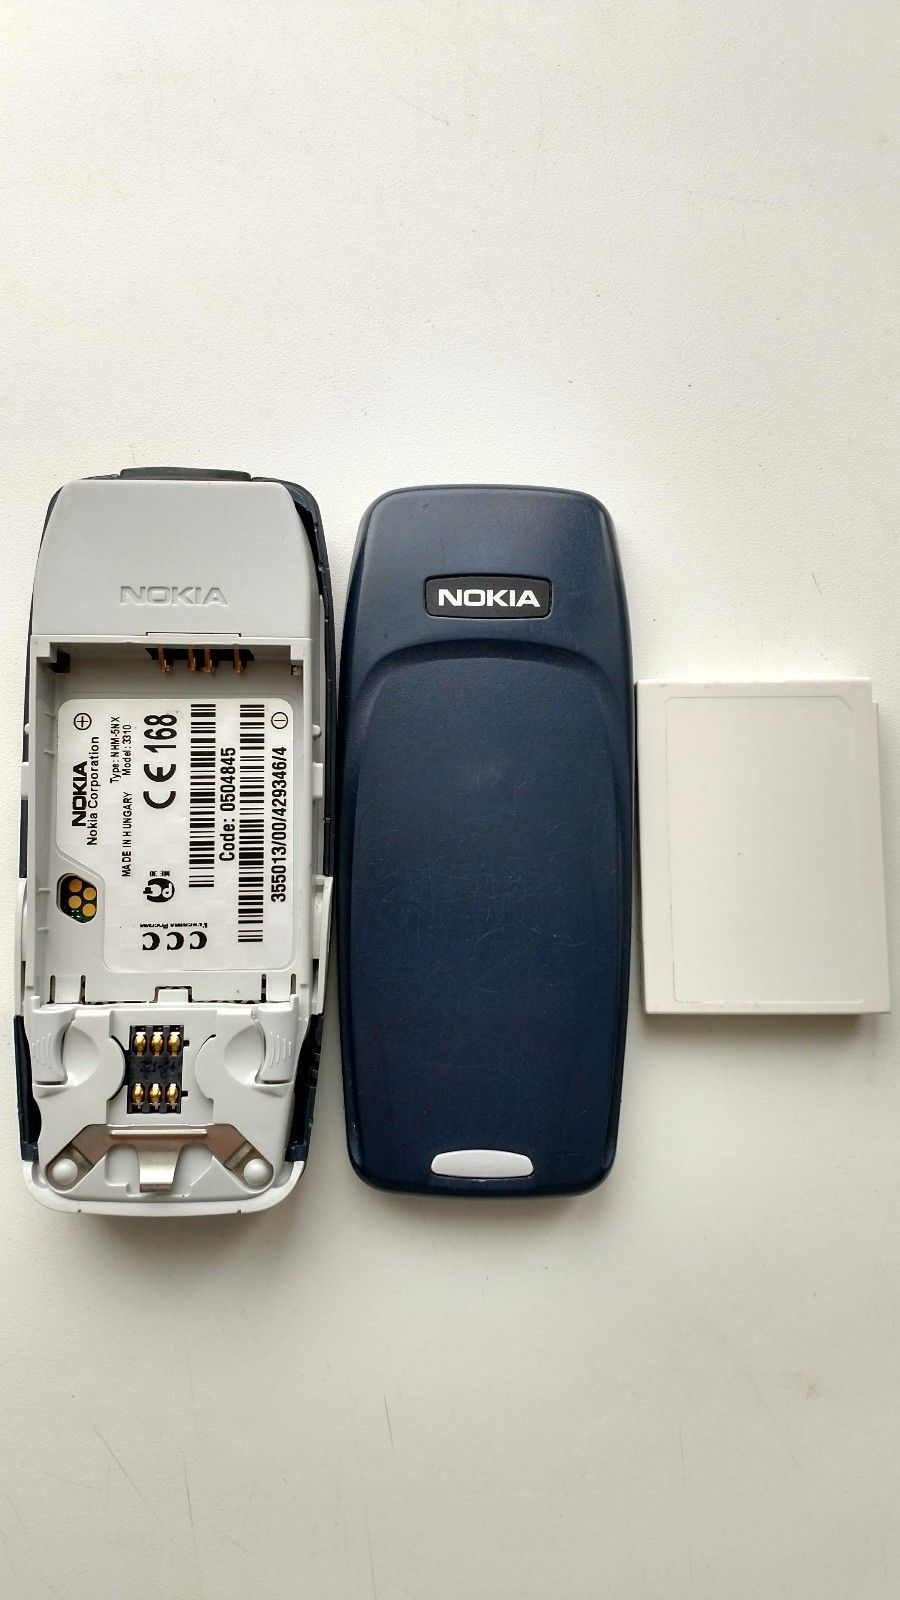 Nokia 3310 se relanseaza la MWC 2017, telefon clasic cu pret mic